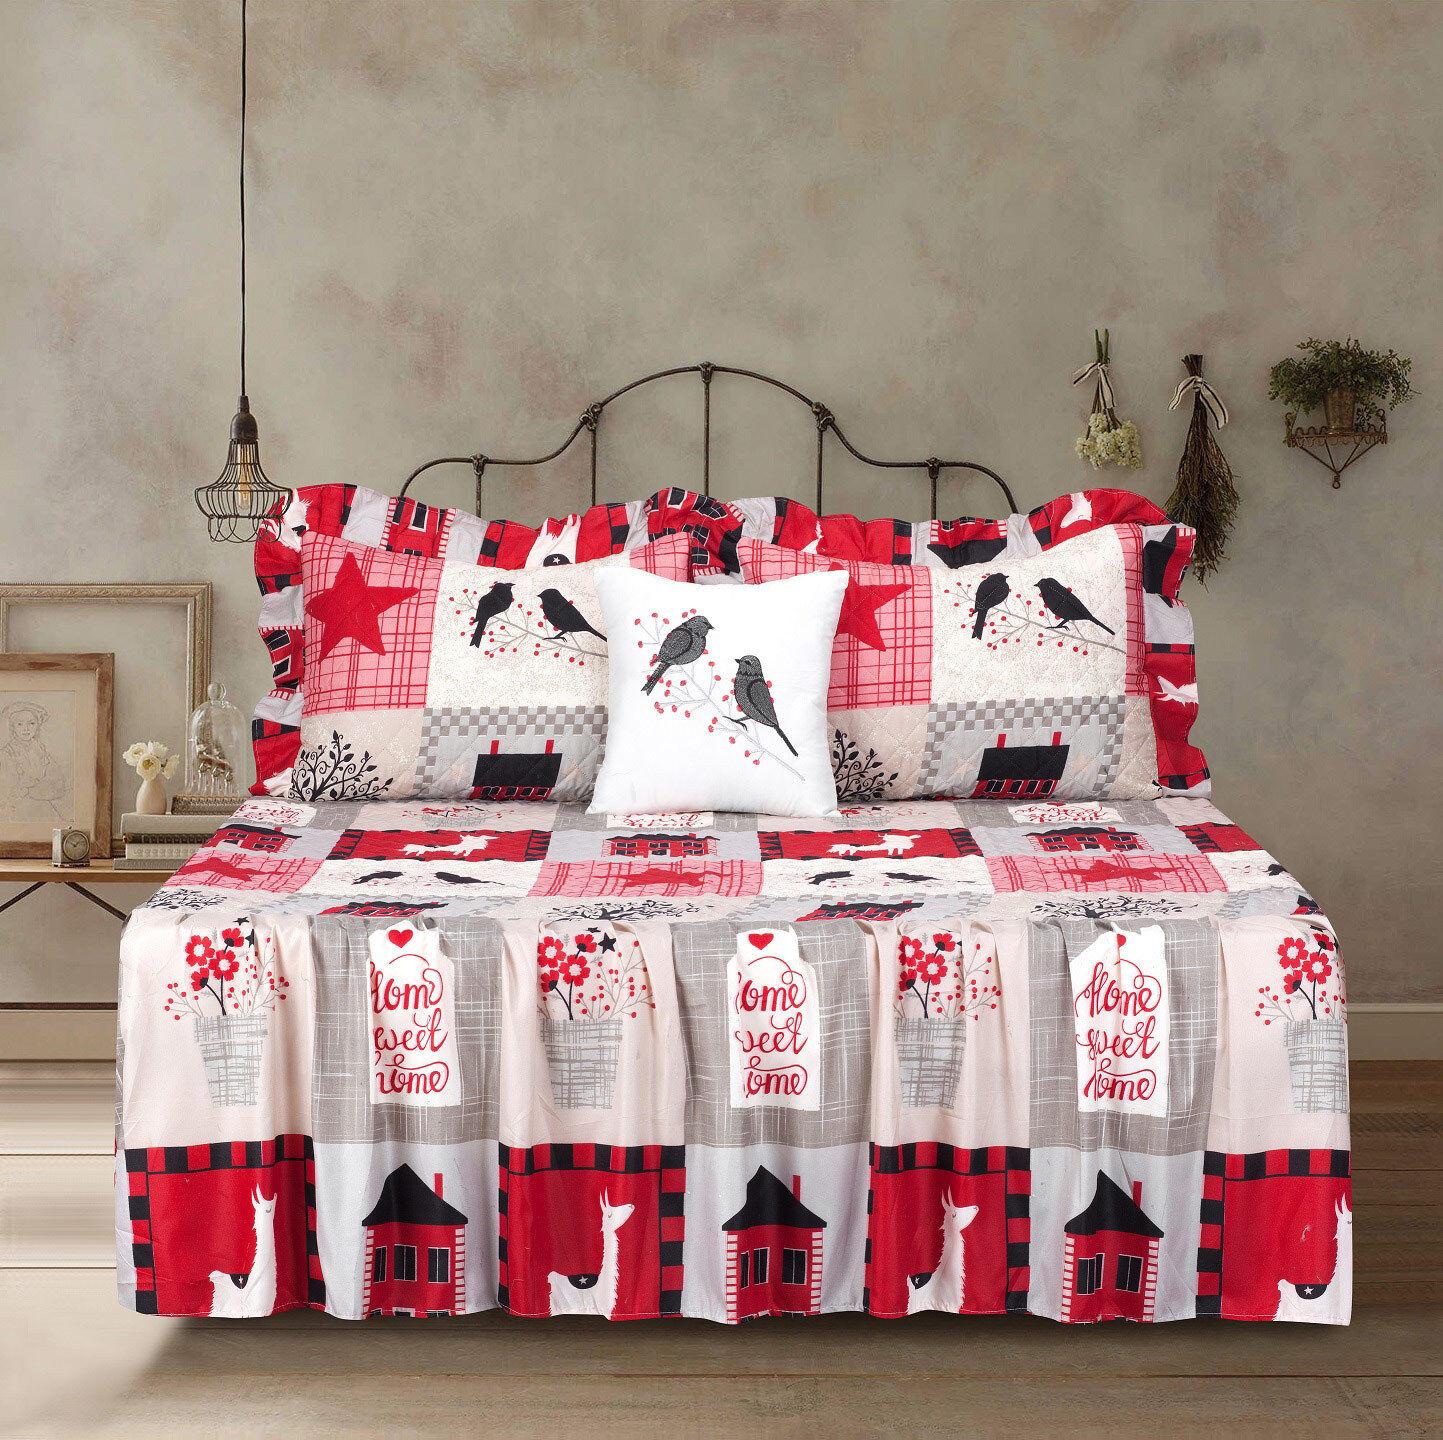 Twin Full Queen or King Quilt Patchwork Bedspread Bedding Set Red Brown Beige Bedding